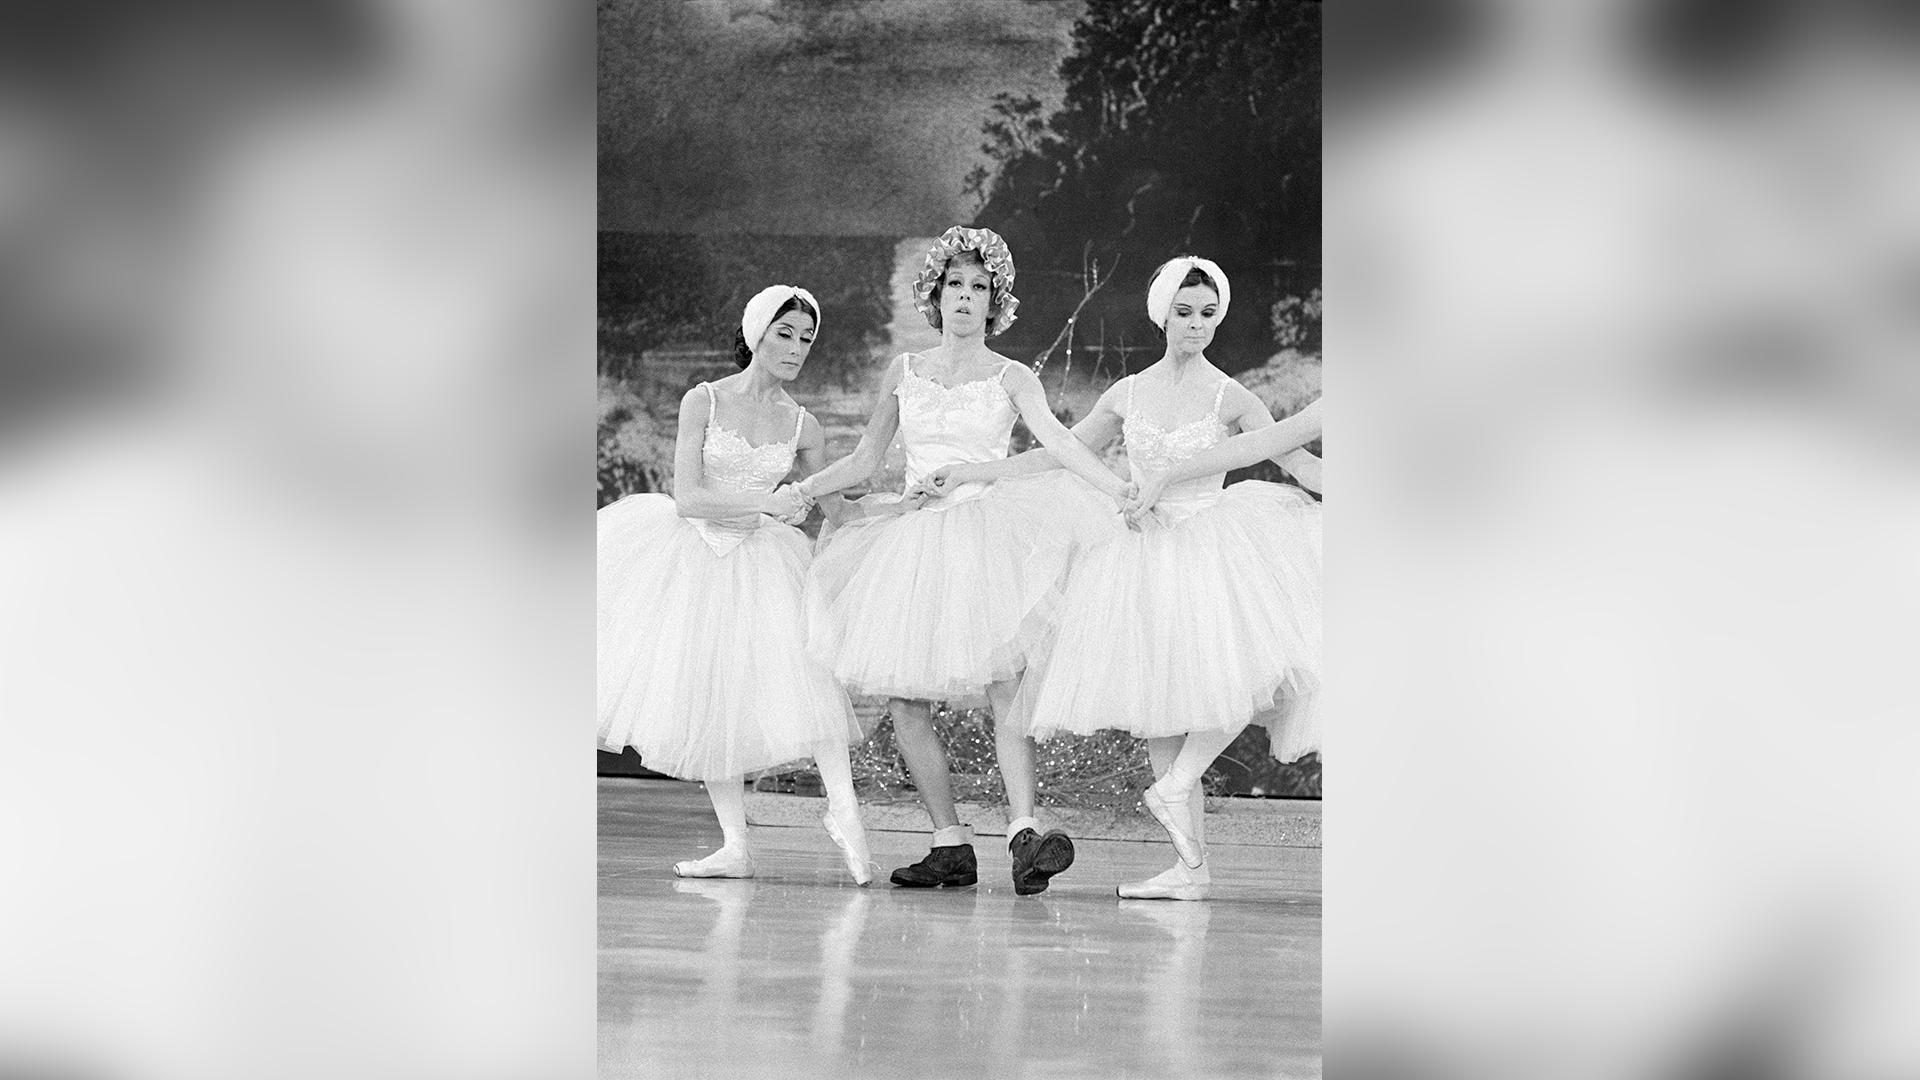 Carol Burnett a bit out of step with her fellow ballerinas.